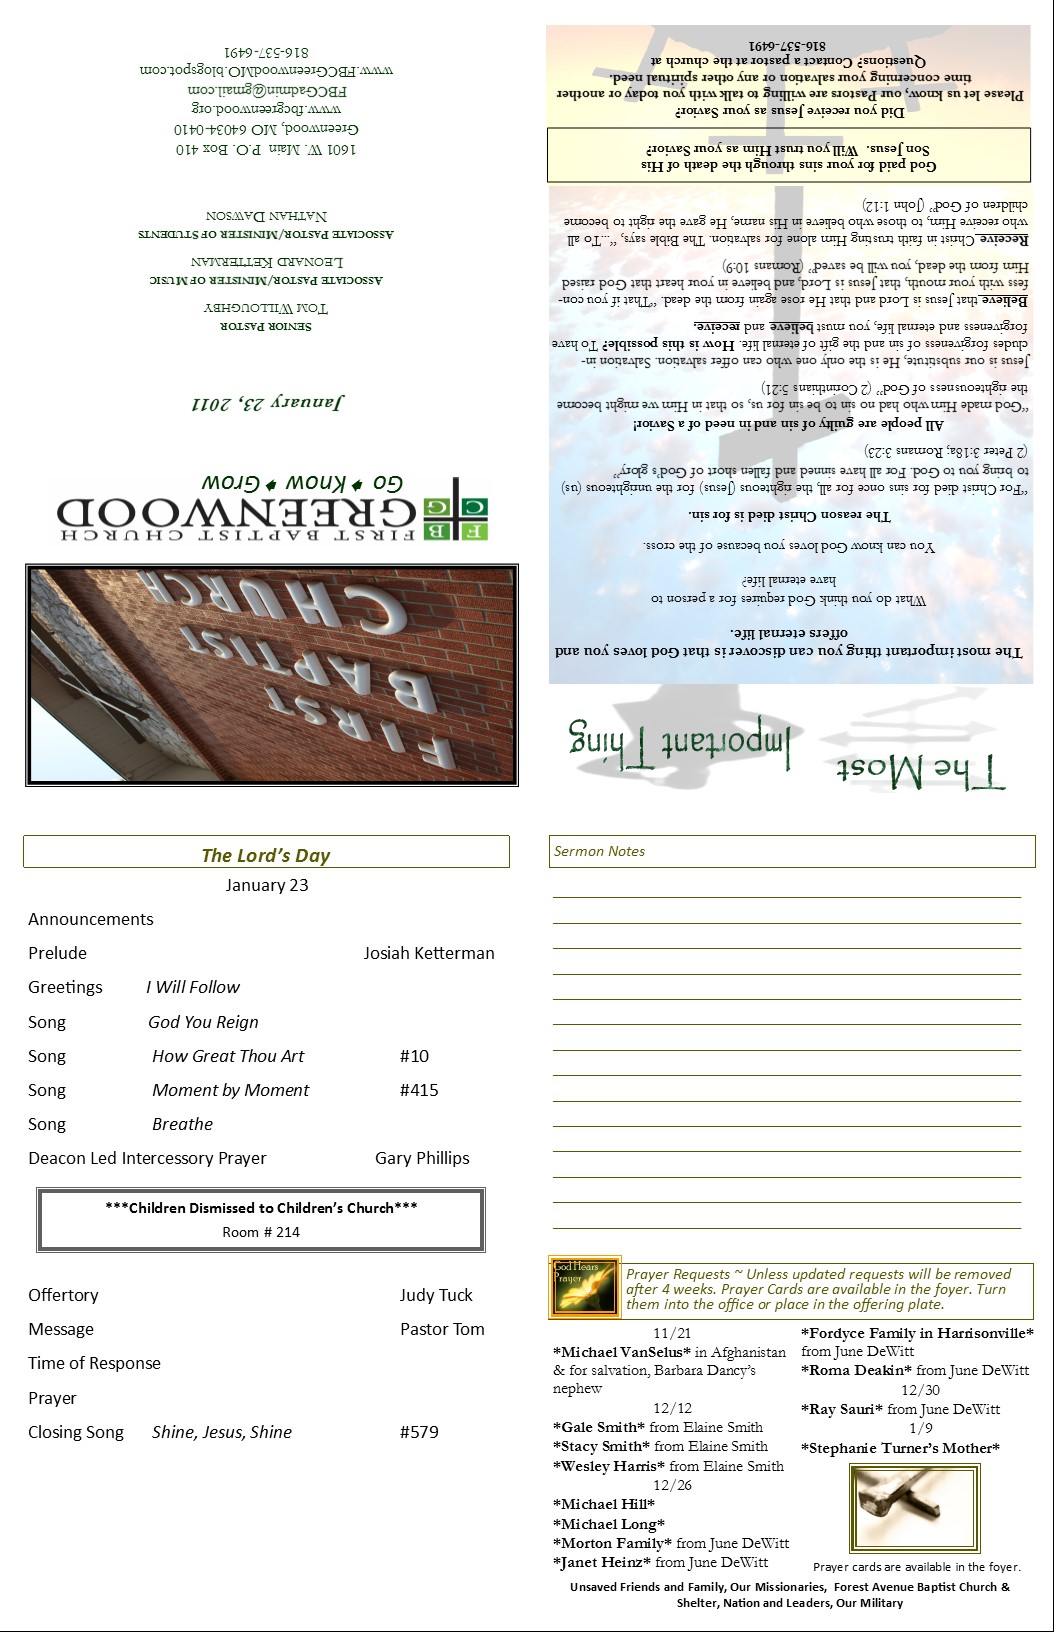 Church Bulletin Template | Effective Church Communications